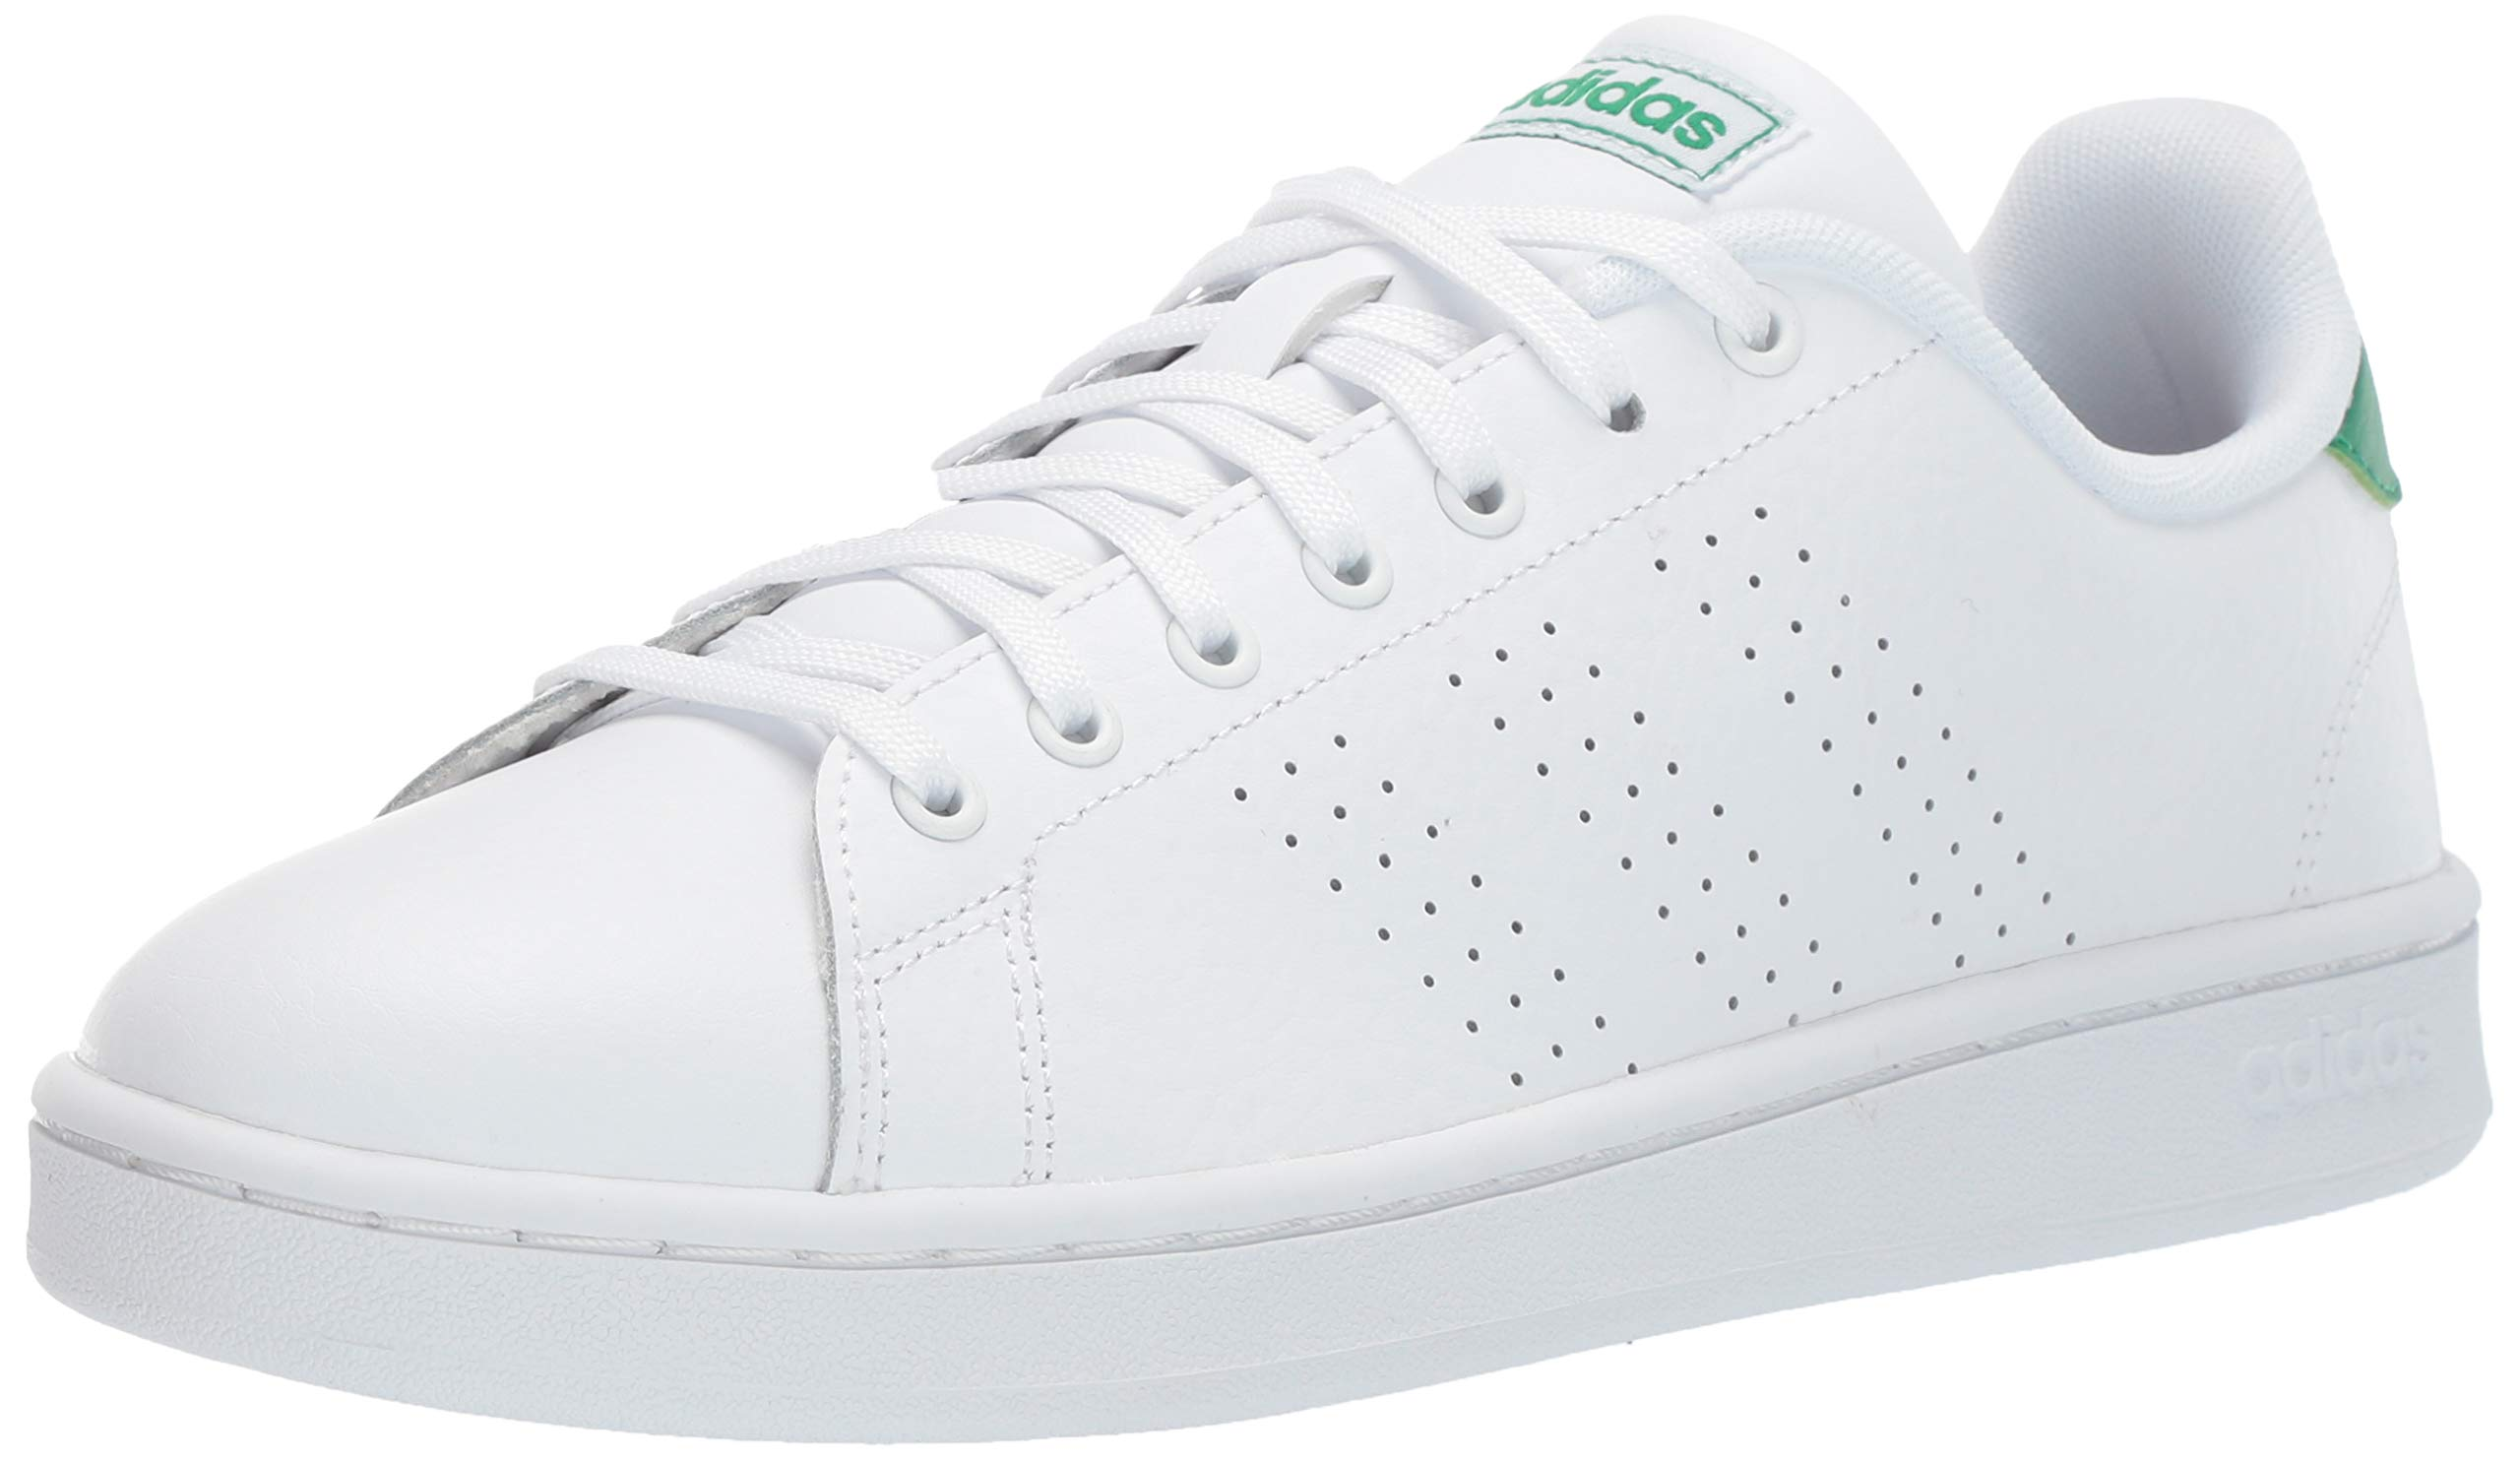 adidas Men's Advantage, White/Green, 4 M US